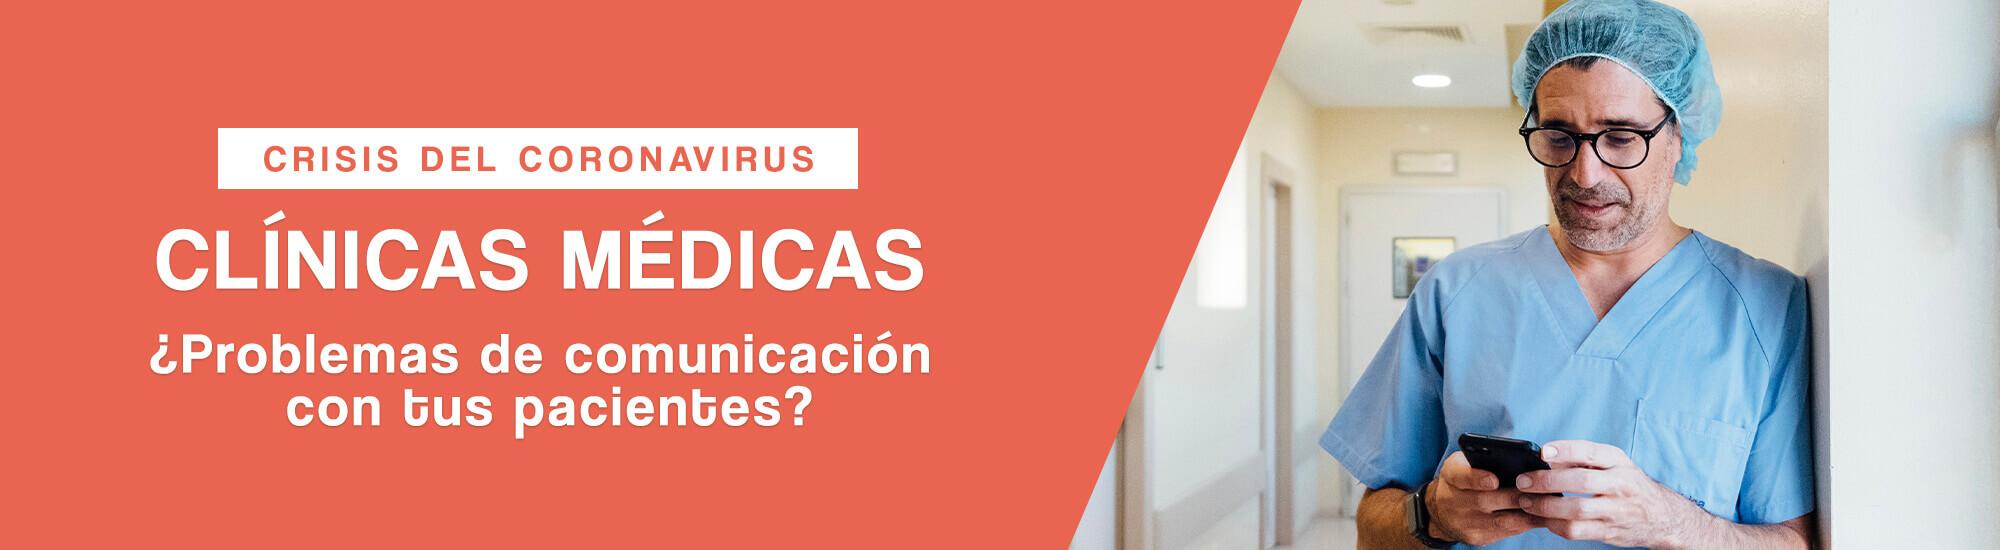 coronavirus-cabecera-web